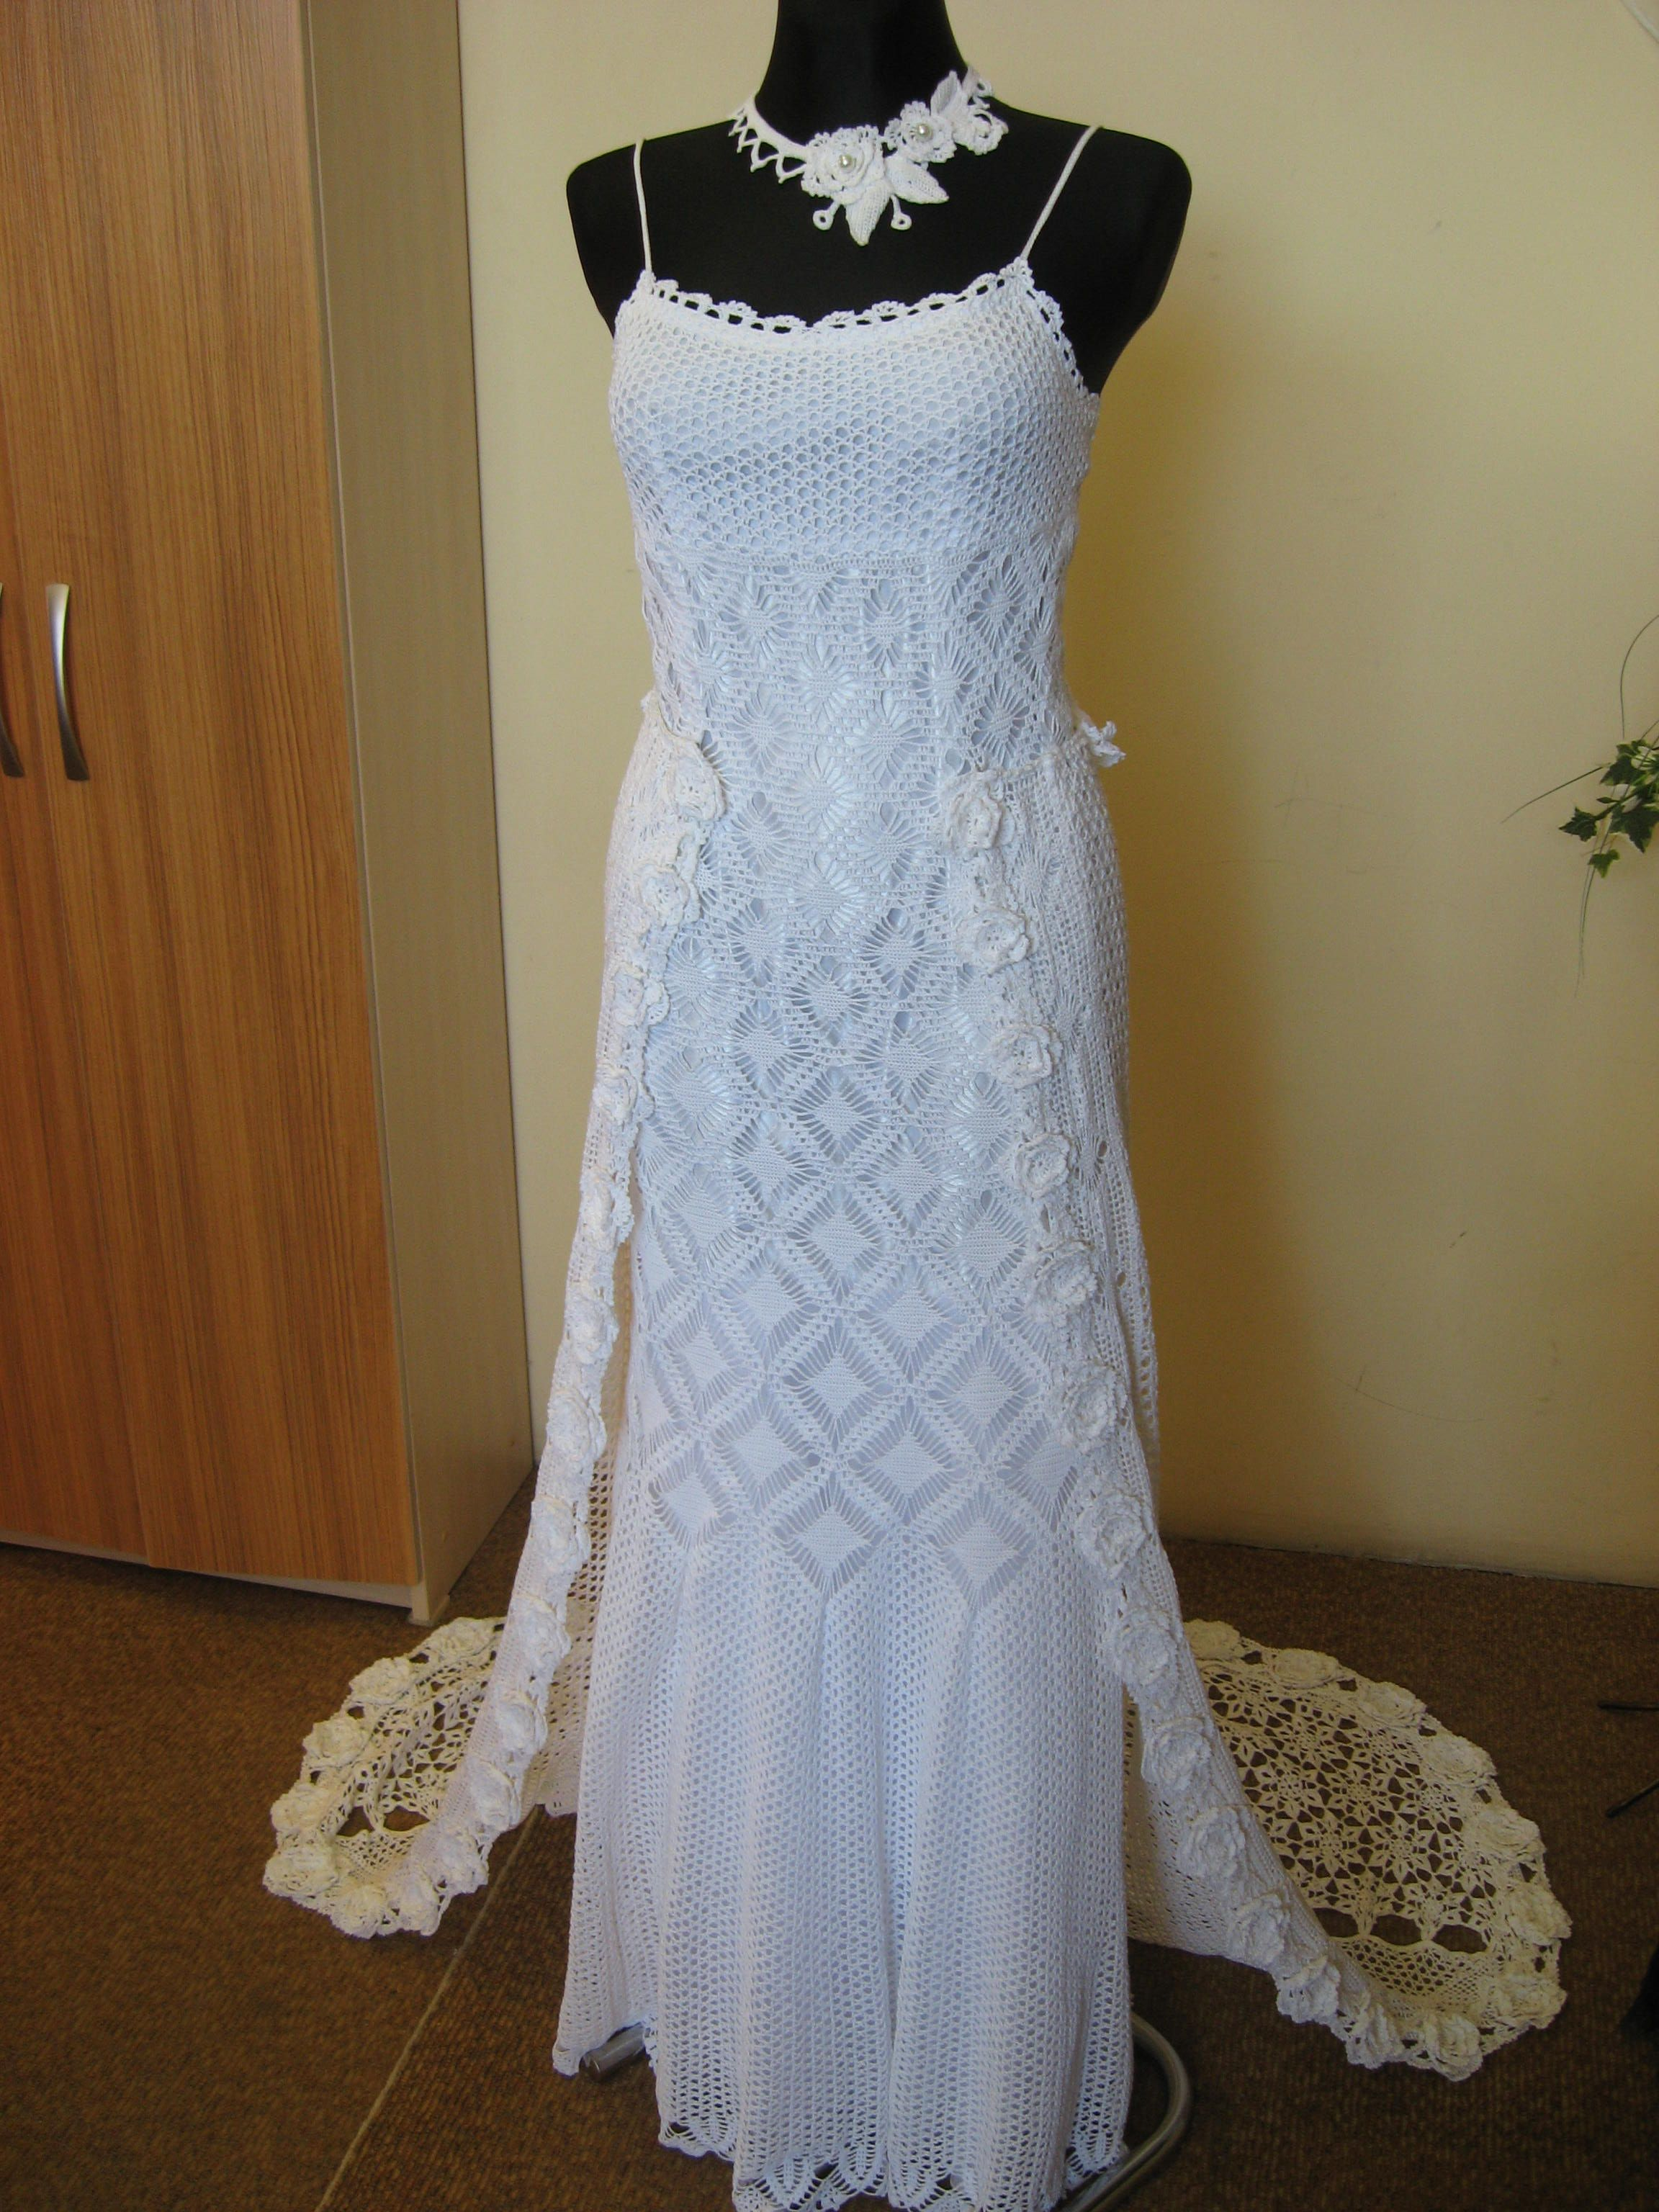 Crocheted wedding dresses | Patterns | Pinterest | Crochet ...